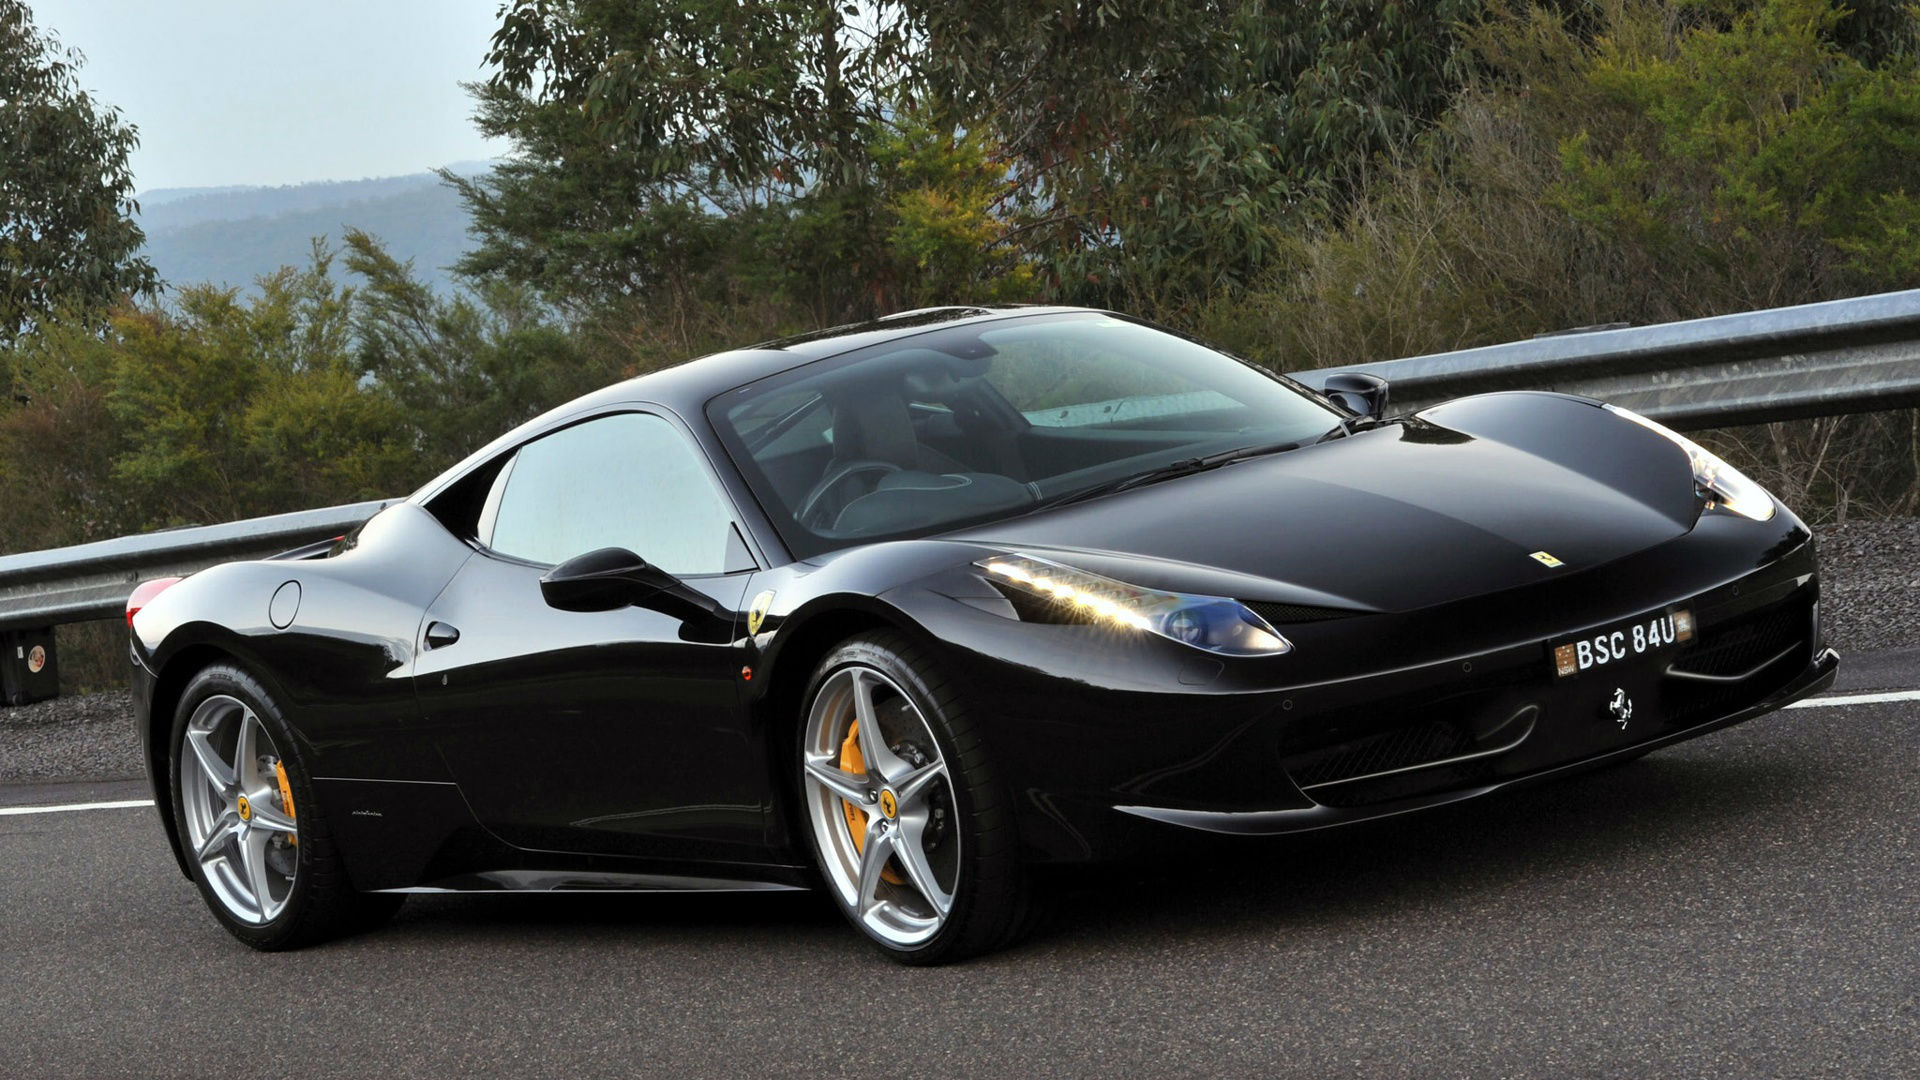 Black Ferrari 458 Italia Wallpaper   iBackgroundWallpaper 1920x1080